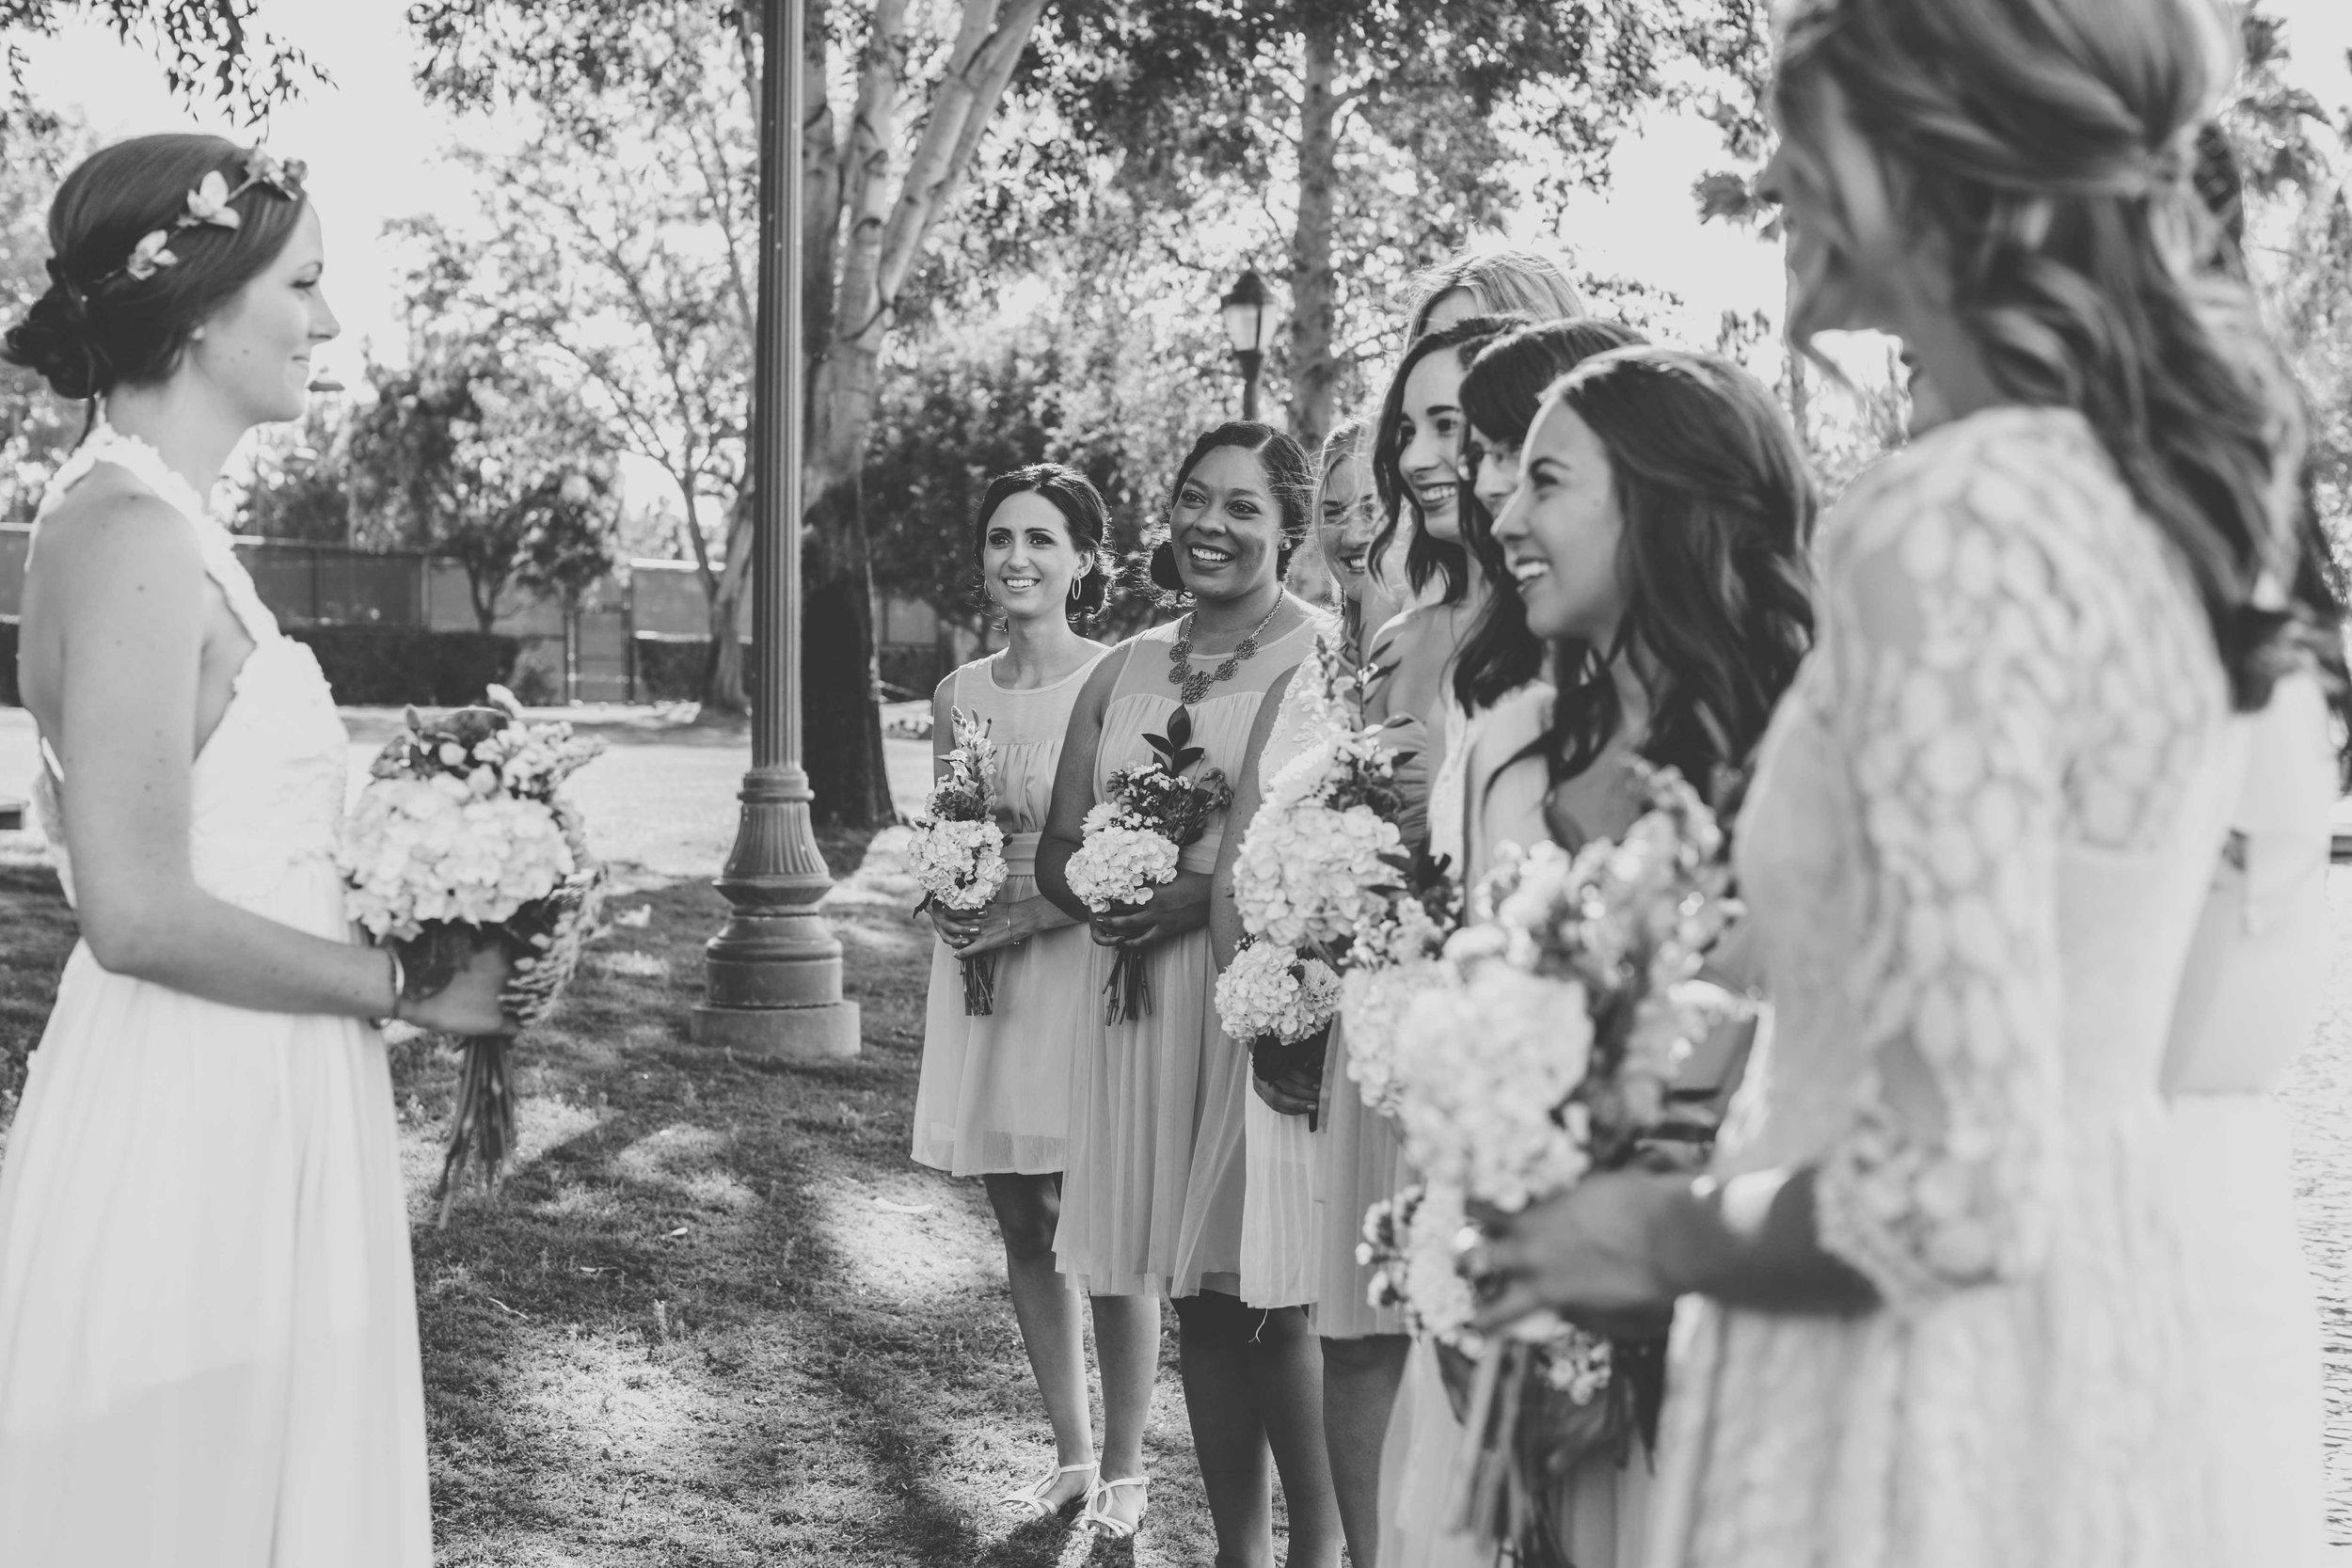 20141024-DePartee-Wedding-APavone-020-sm.jpg